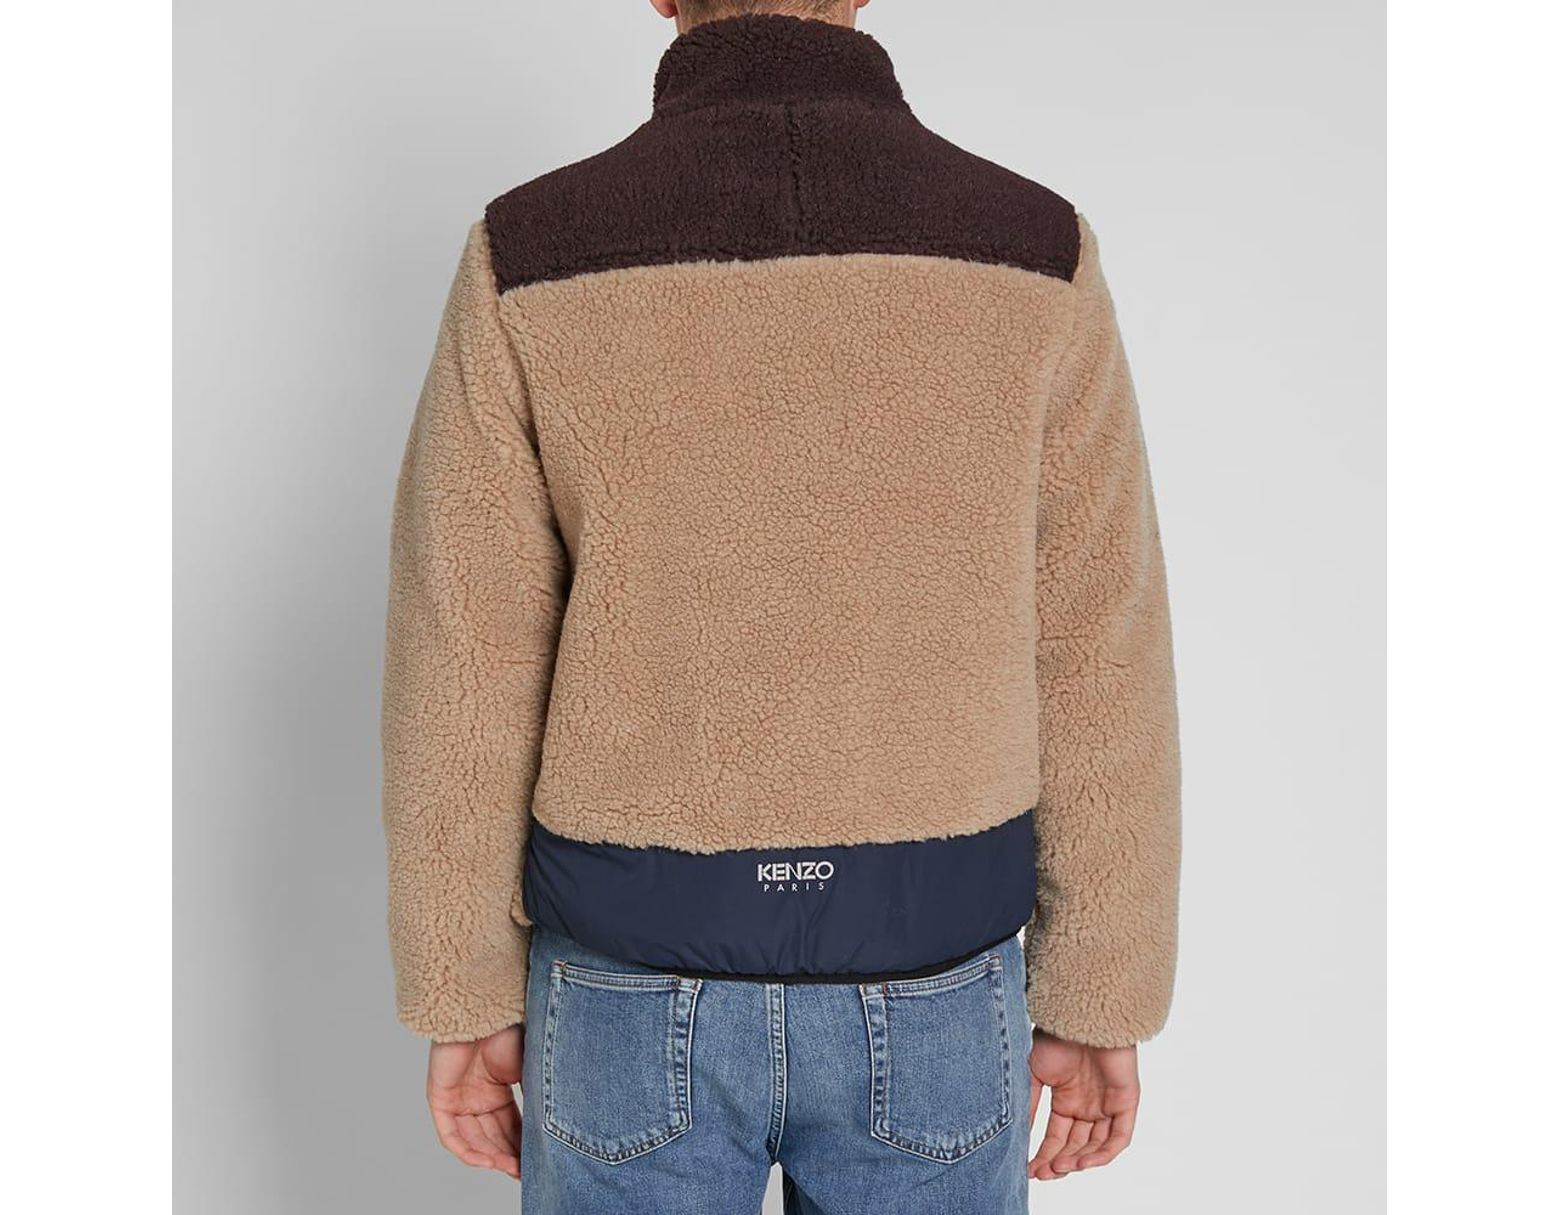 6d2fb140ea KENZO Shearling Down Jacket in Brown for Men - Lyst